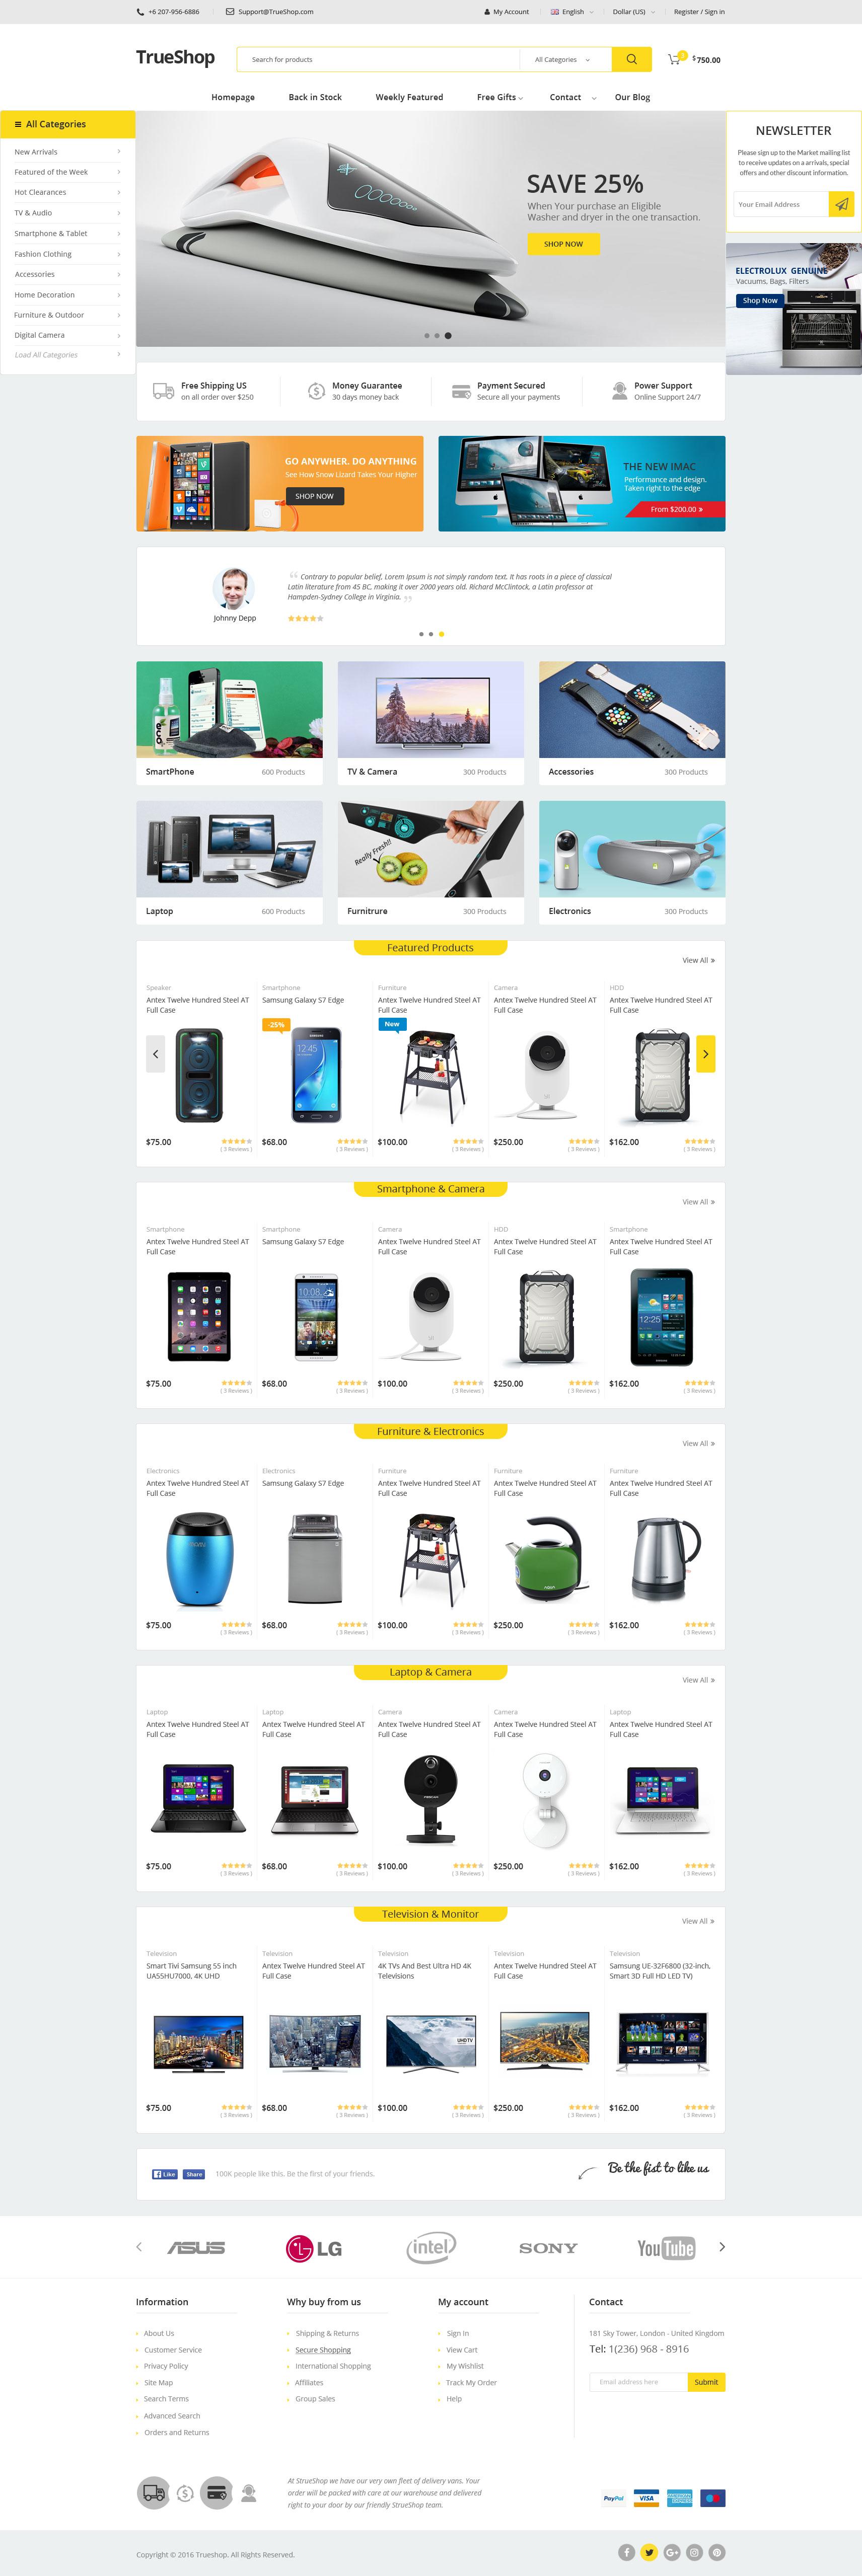 Google chrome themes johnny depp - Trueshop Multipurpose Wordpress Theme